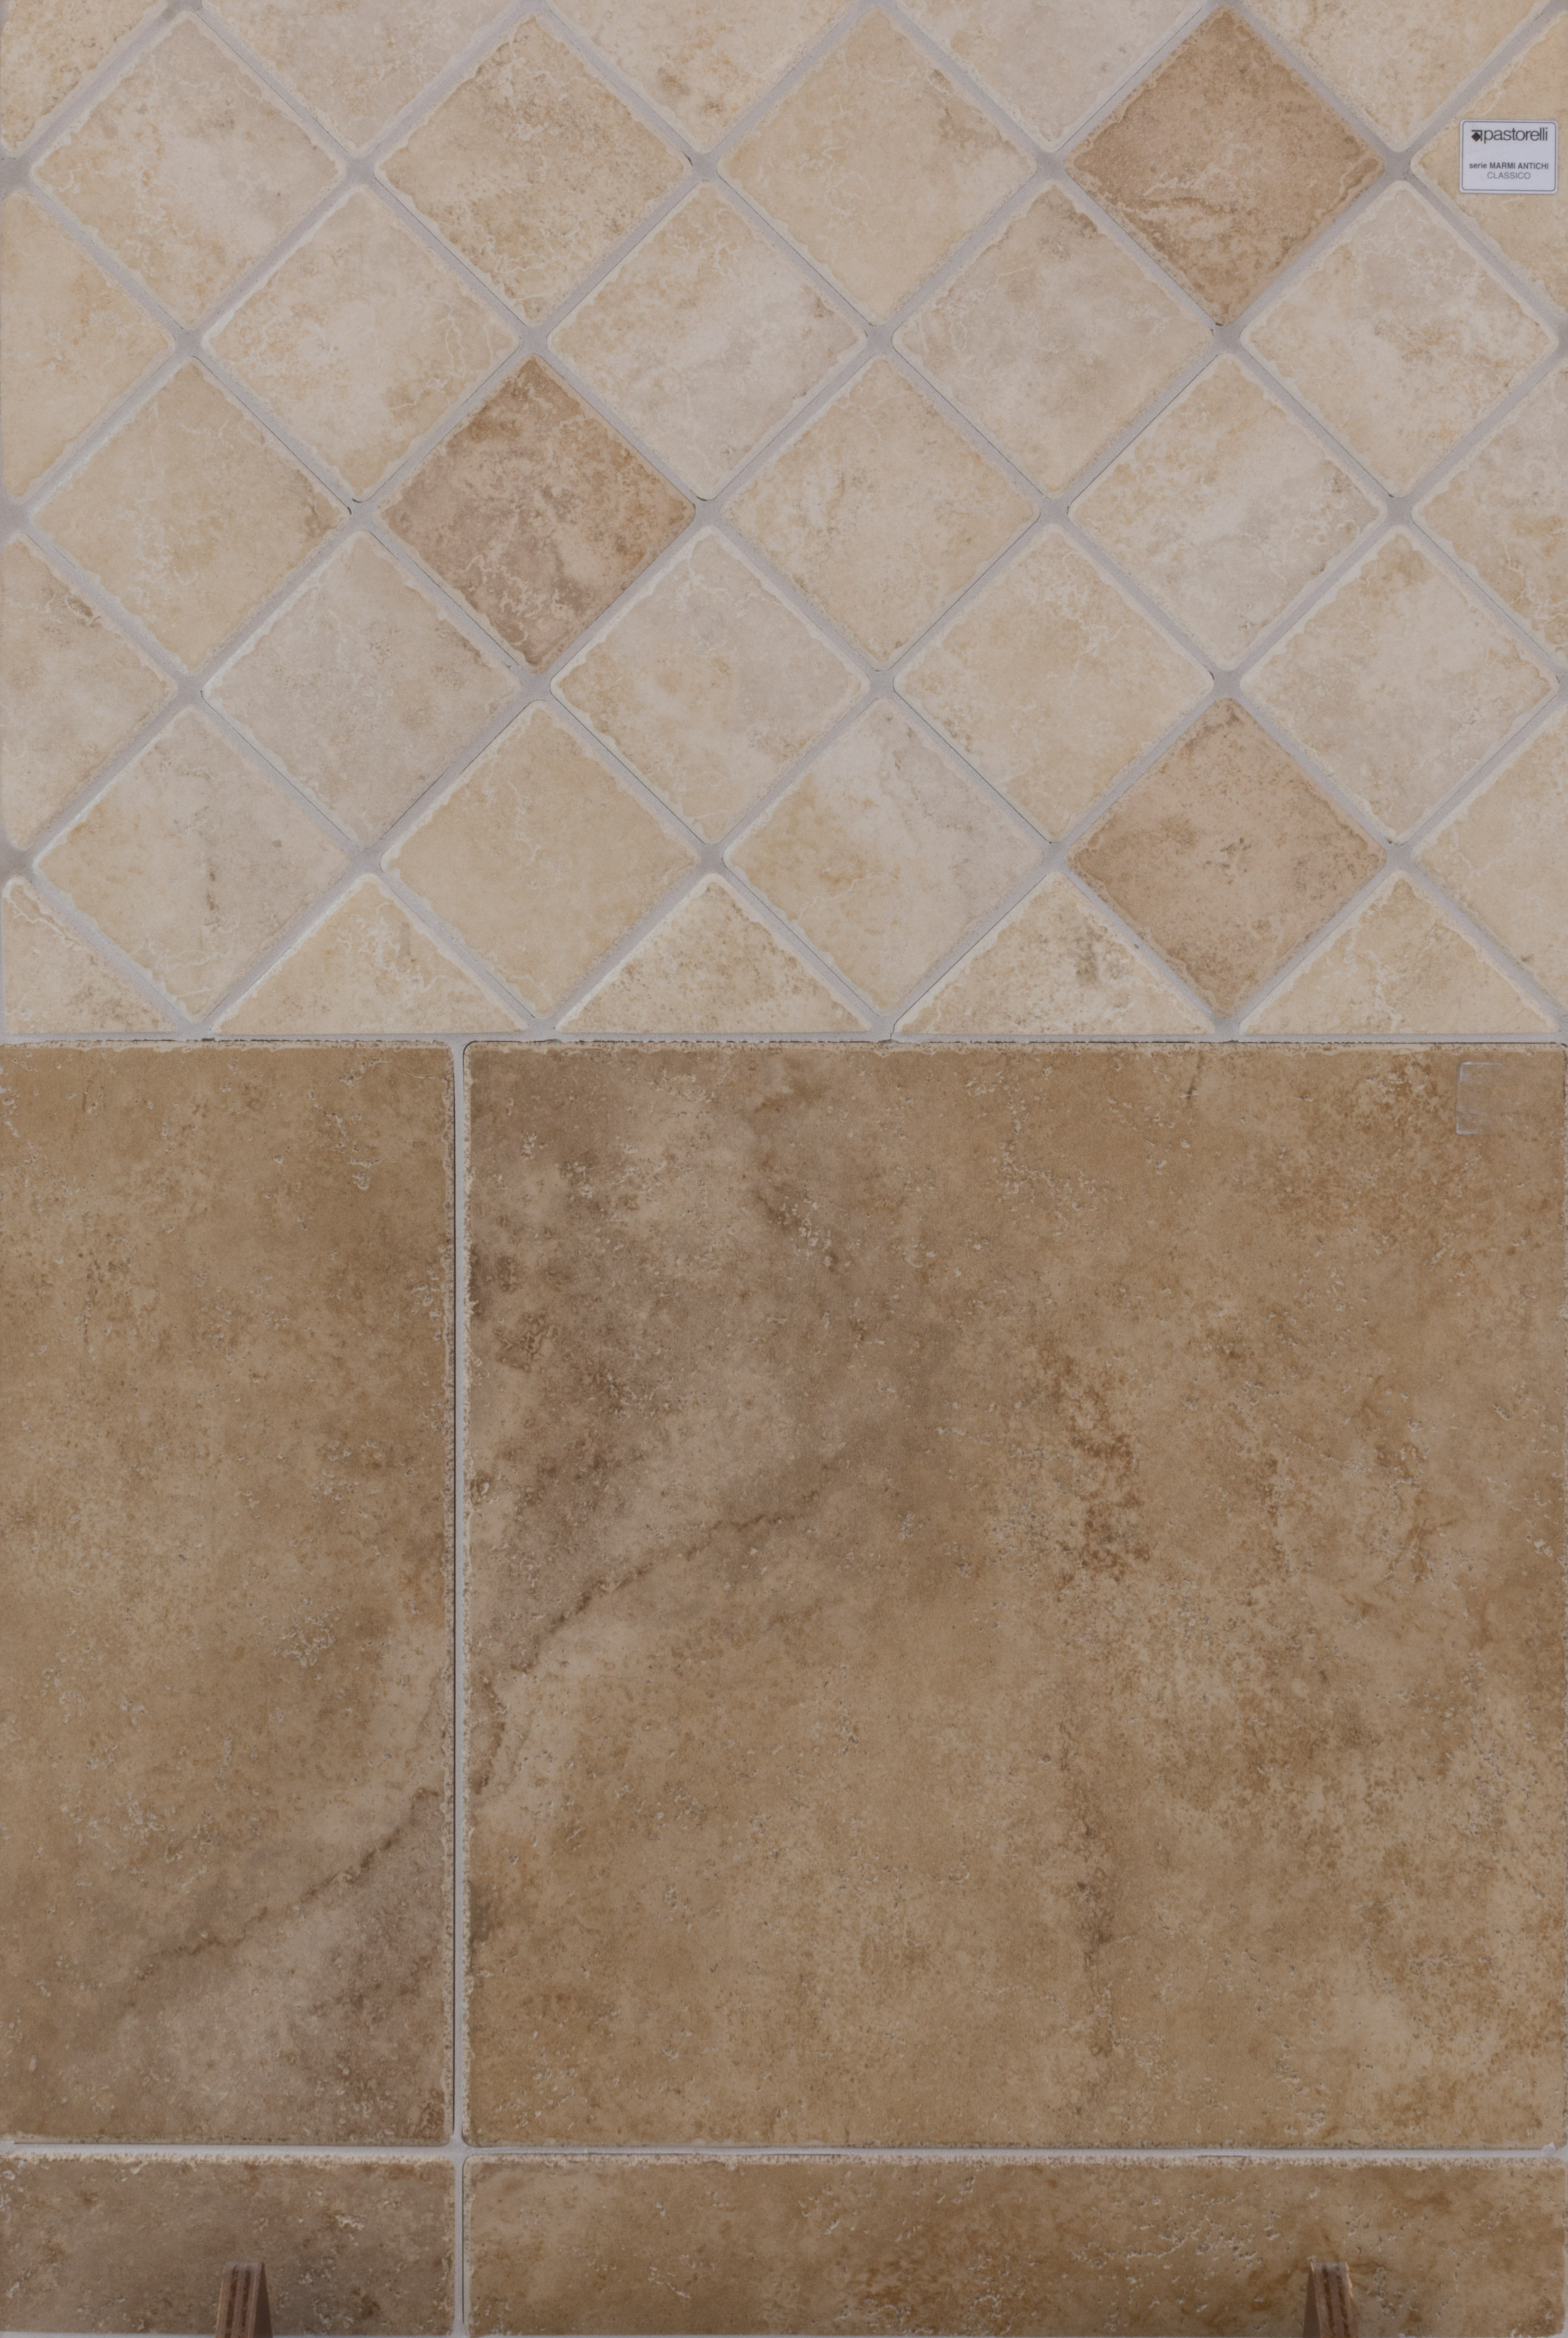 Athens Ceramic Tiles